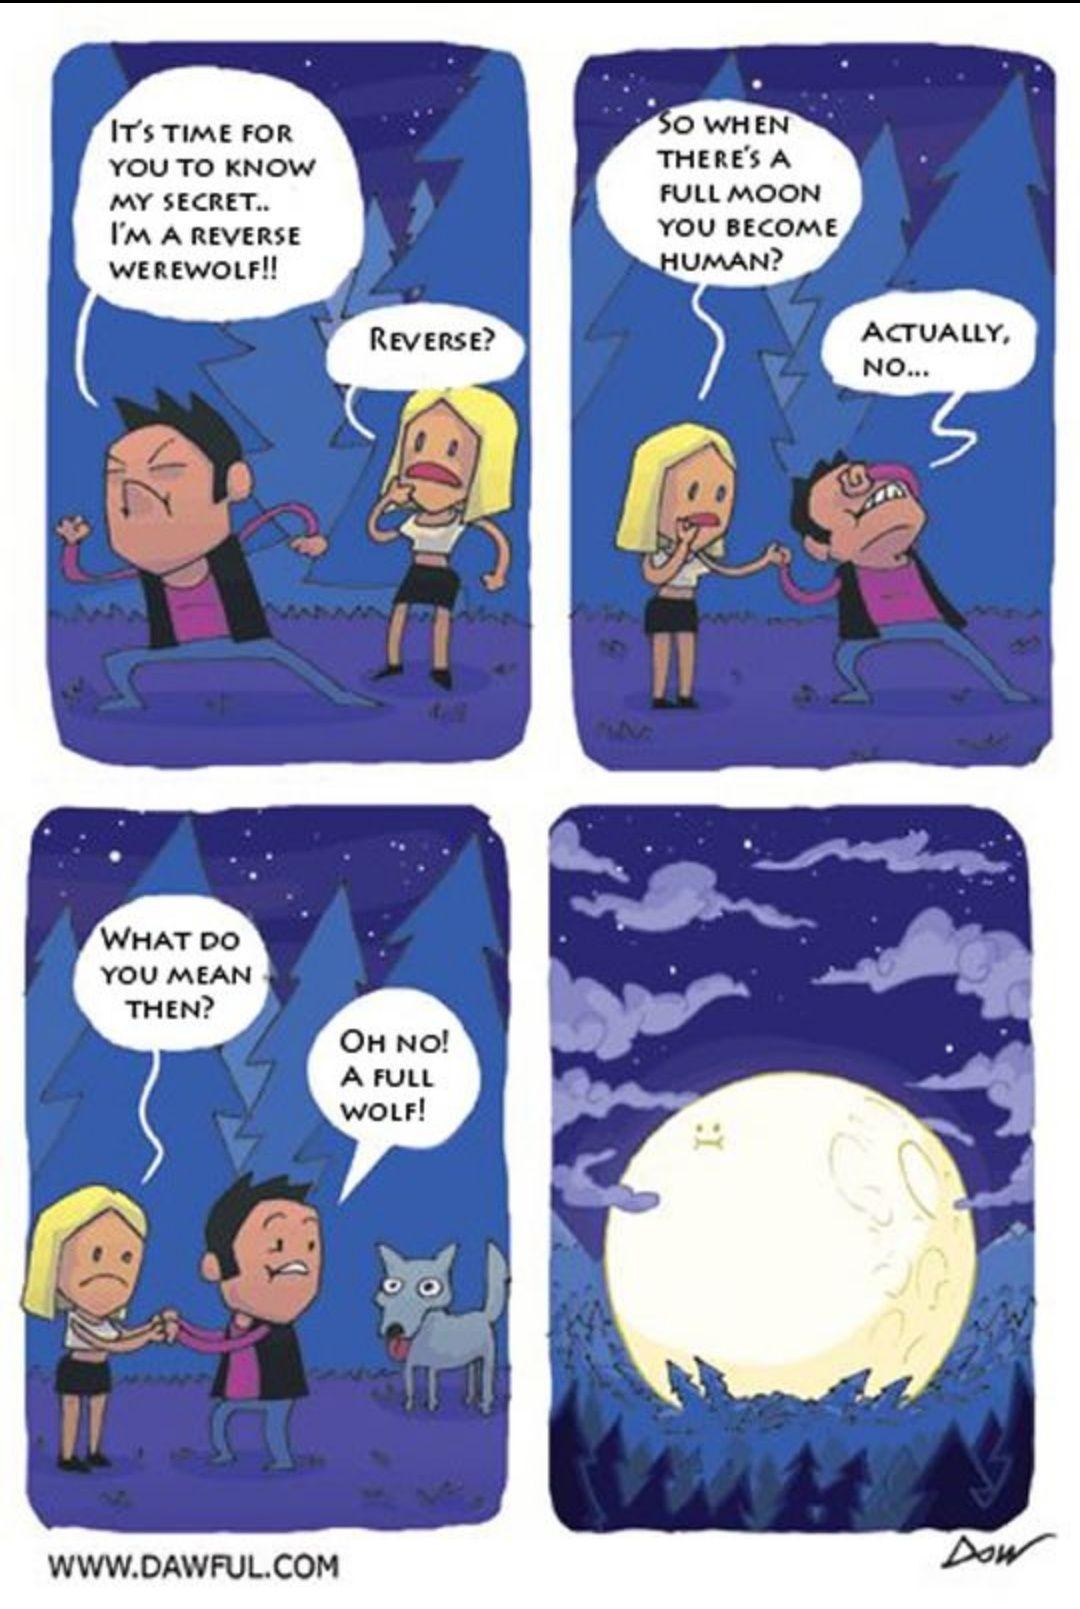 Some good web comic